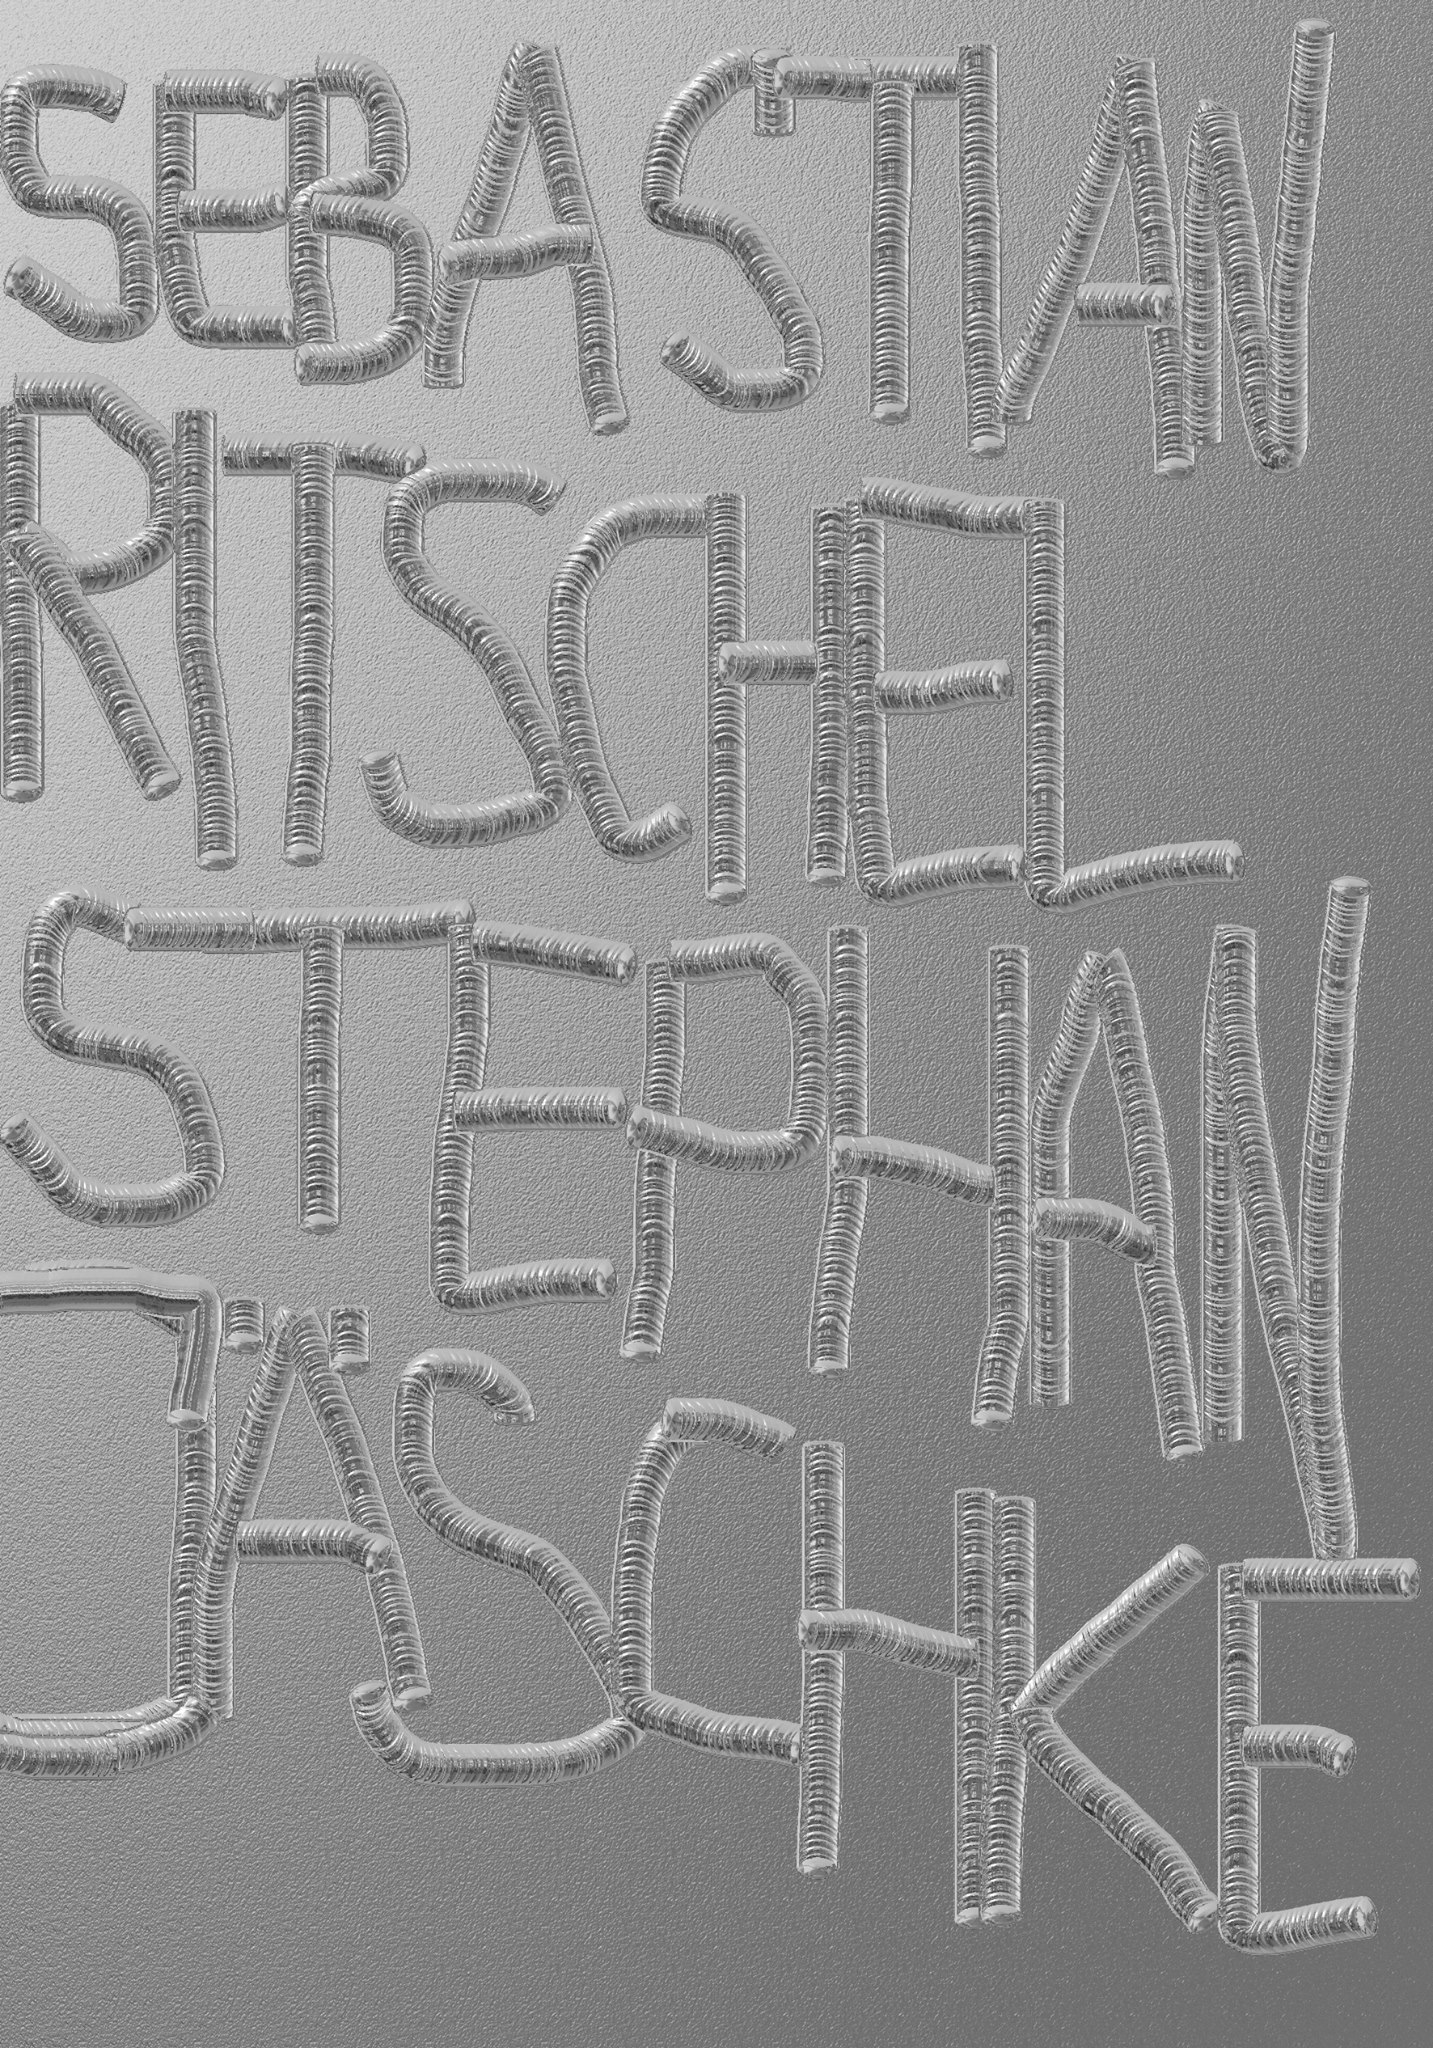 ritschel-jaeschke-elektrohaus